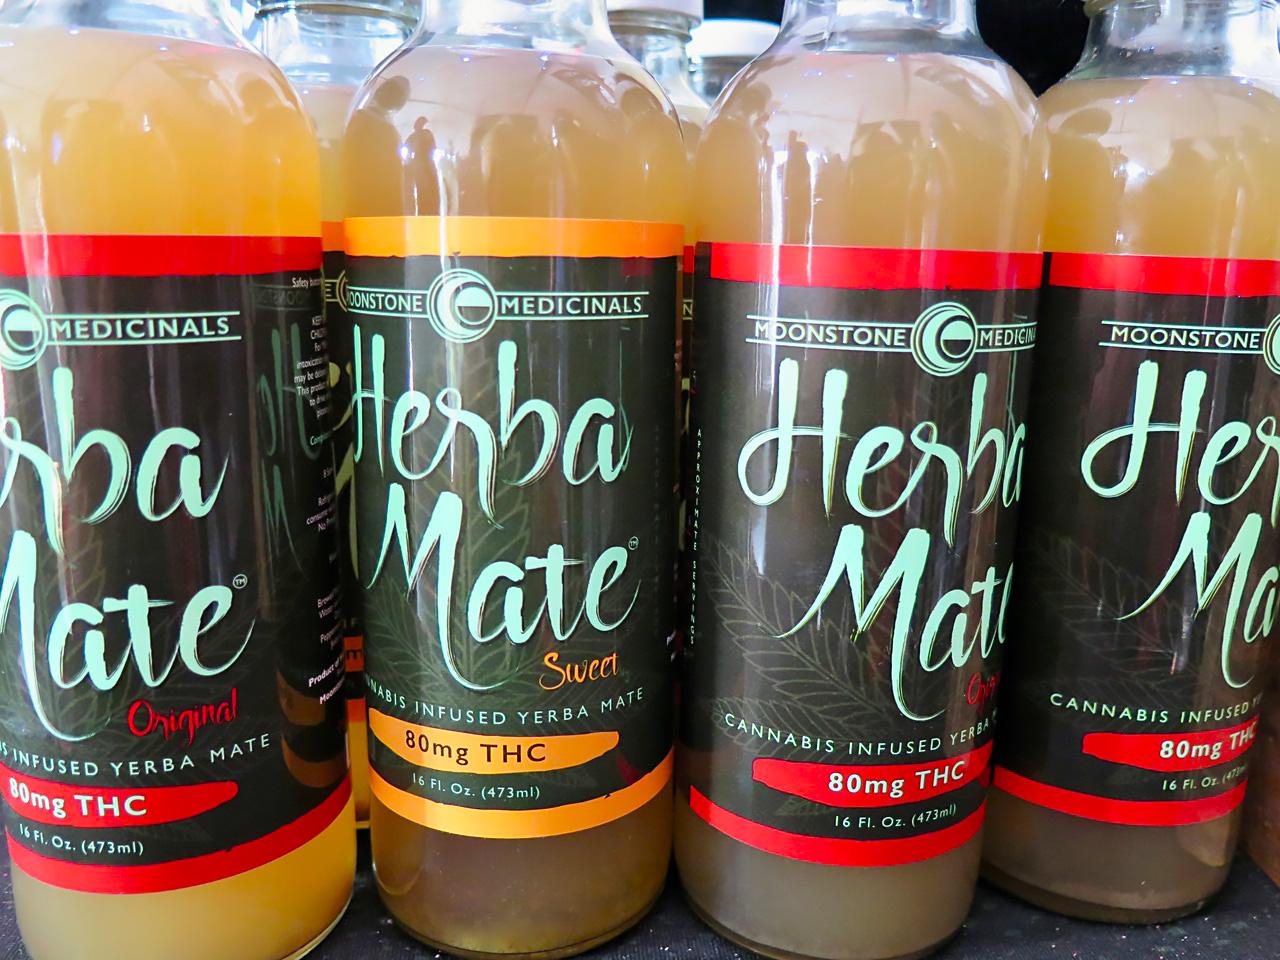 Moonstone Medicinal's Herba Mate tea